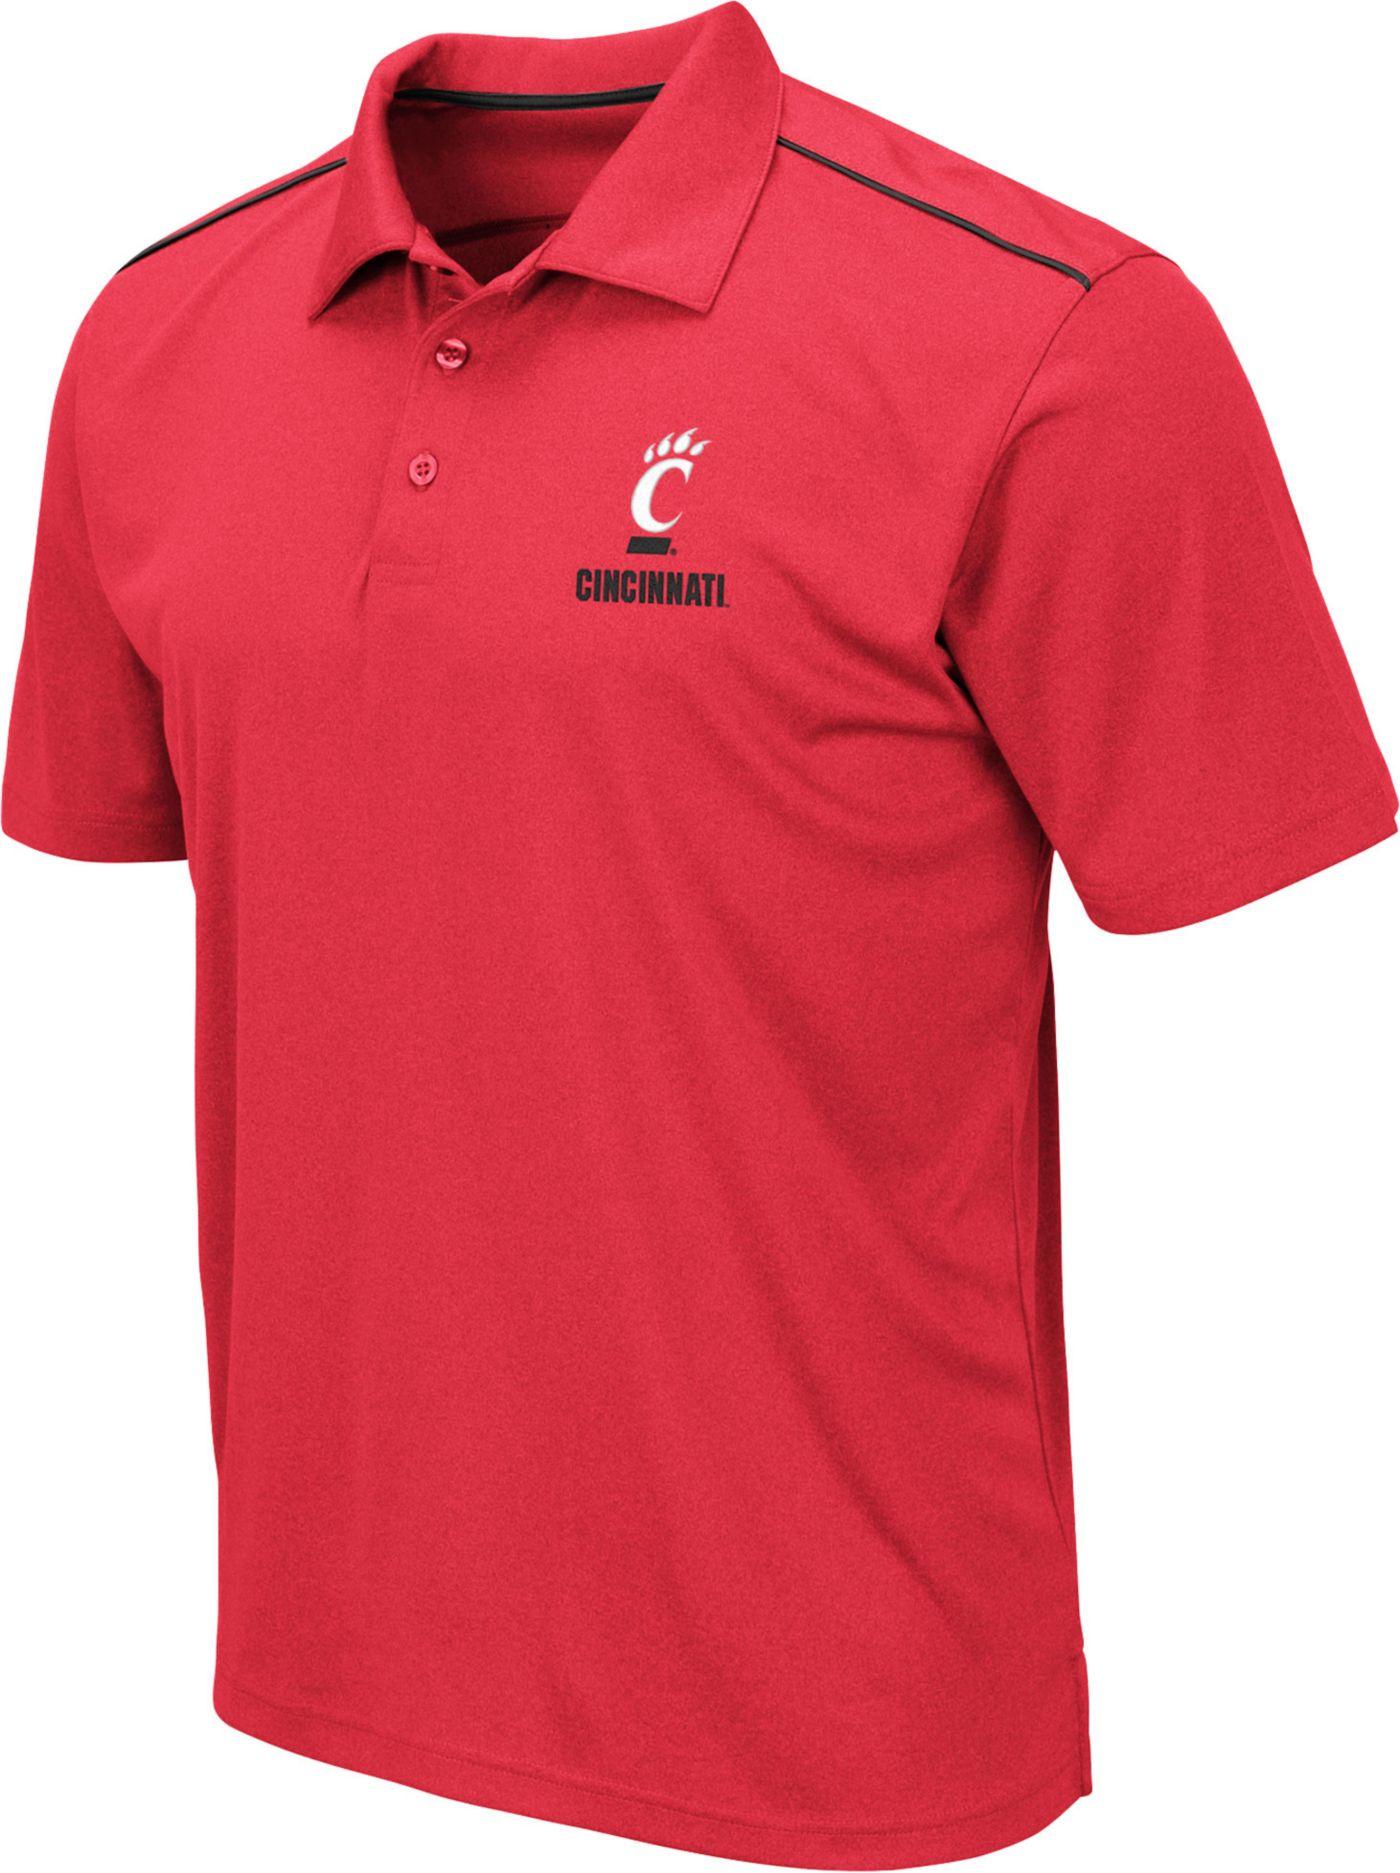 Colosseum Men's Cincinnati Bearcats Red Eagle Polo